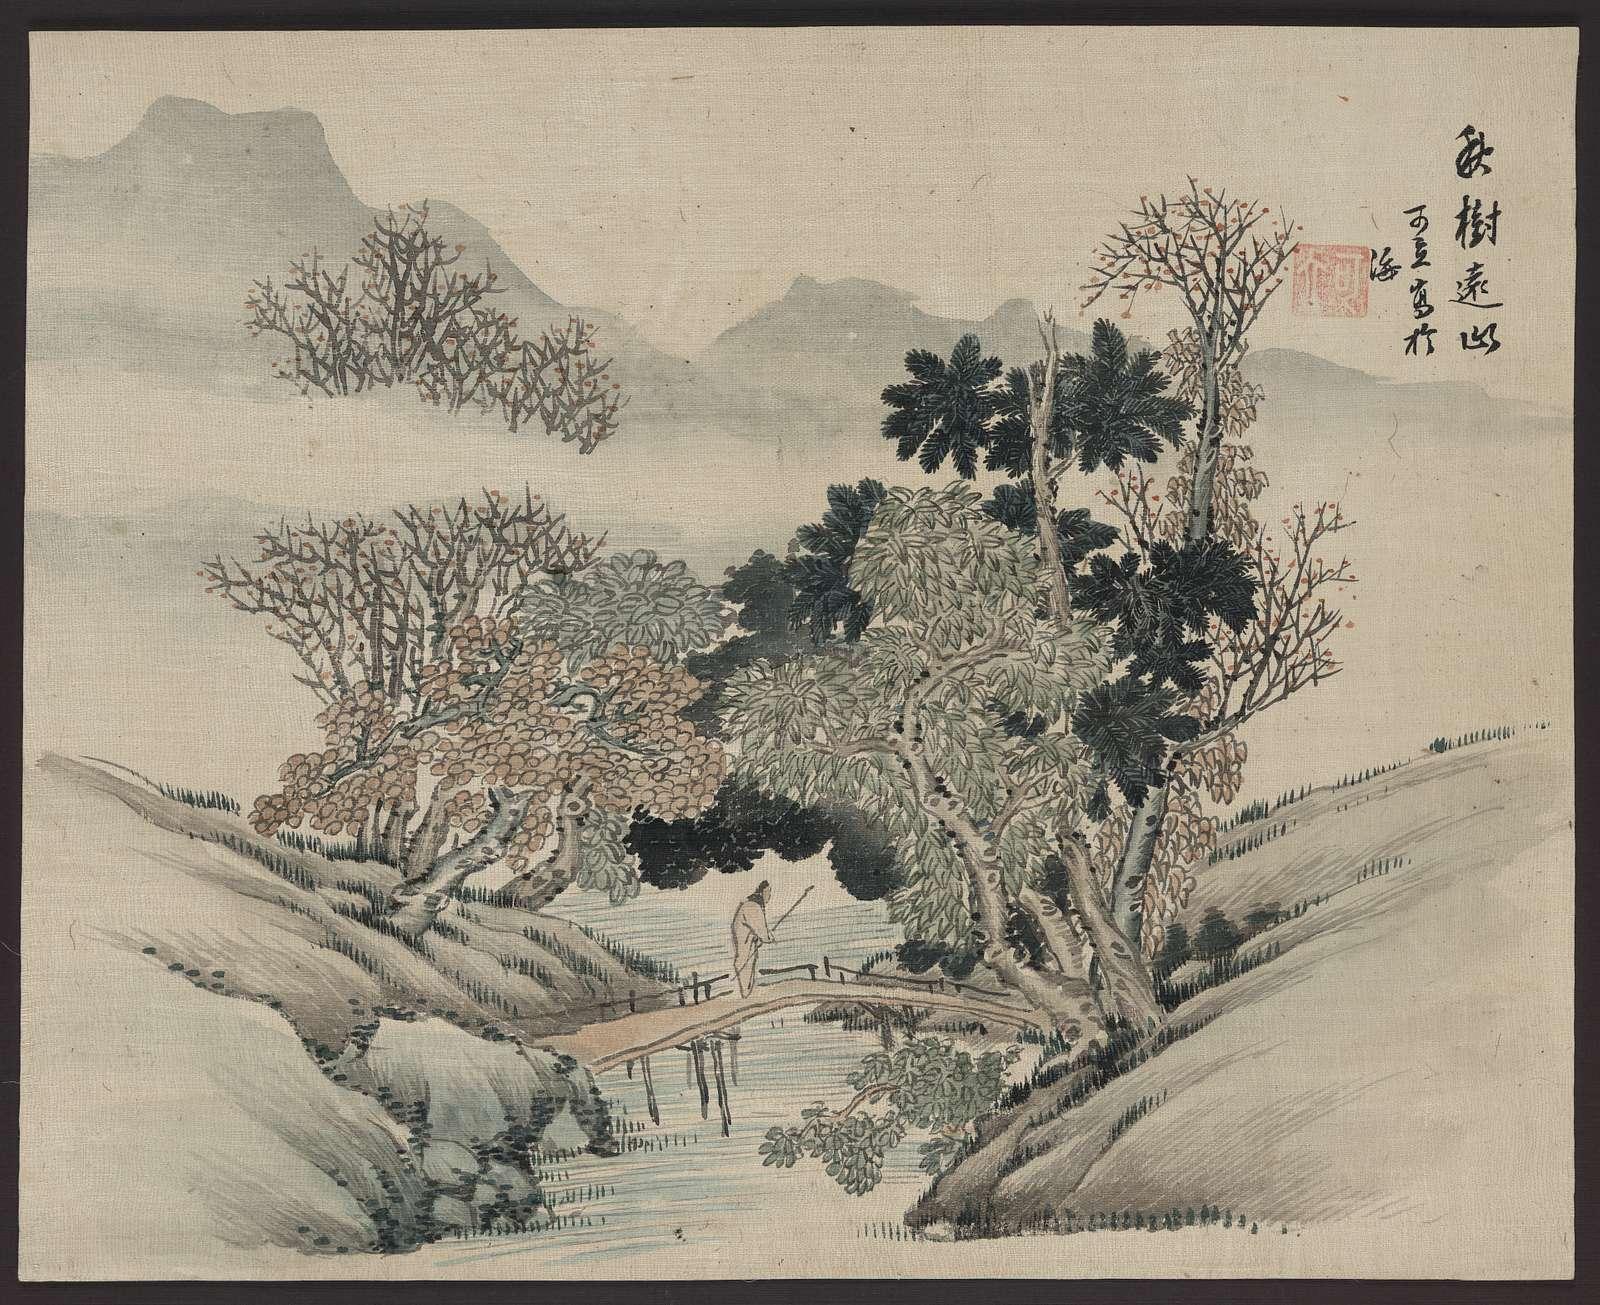 [A man crossing a bridge beneath overhanging trees]